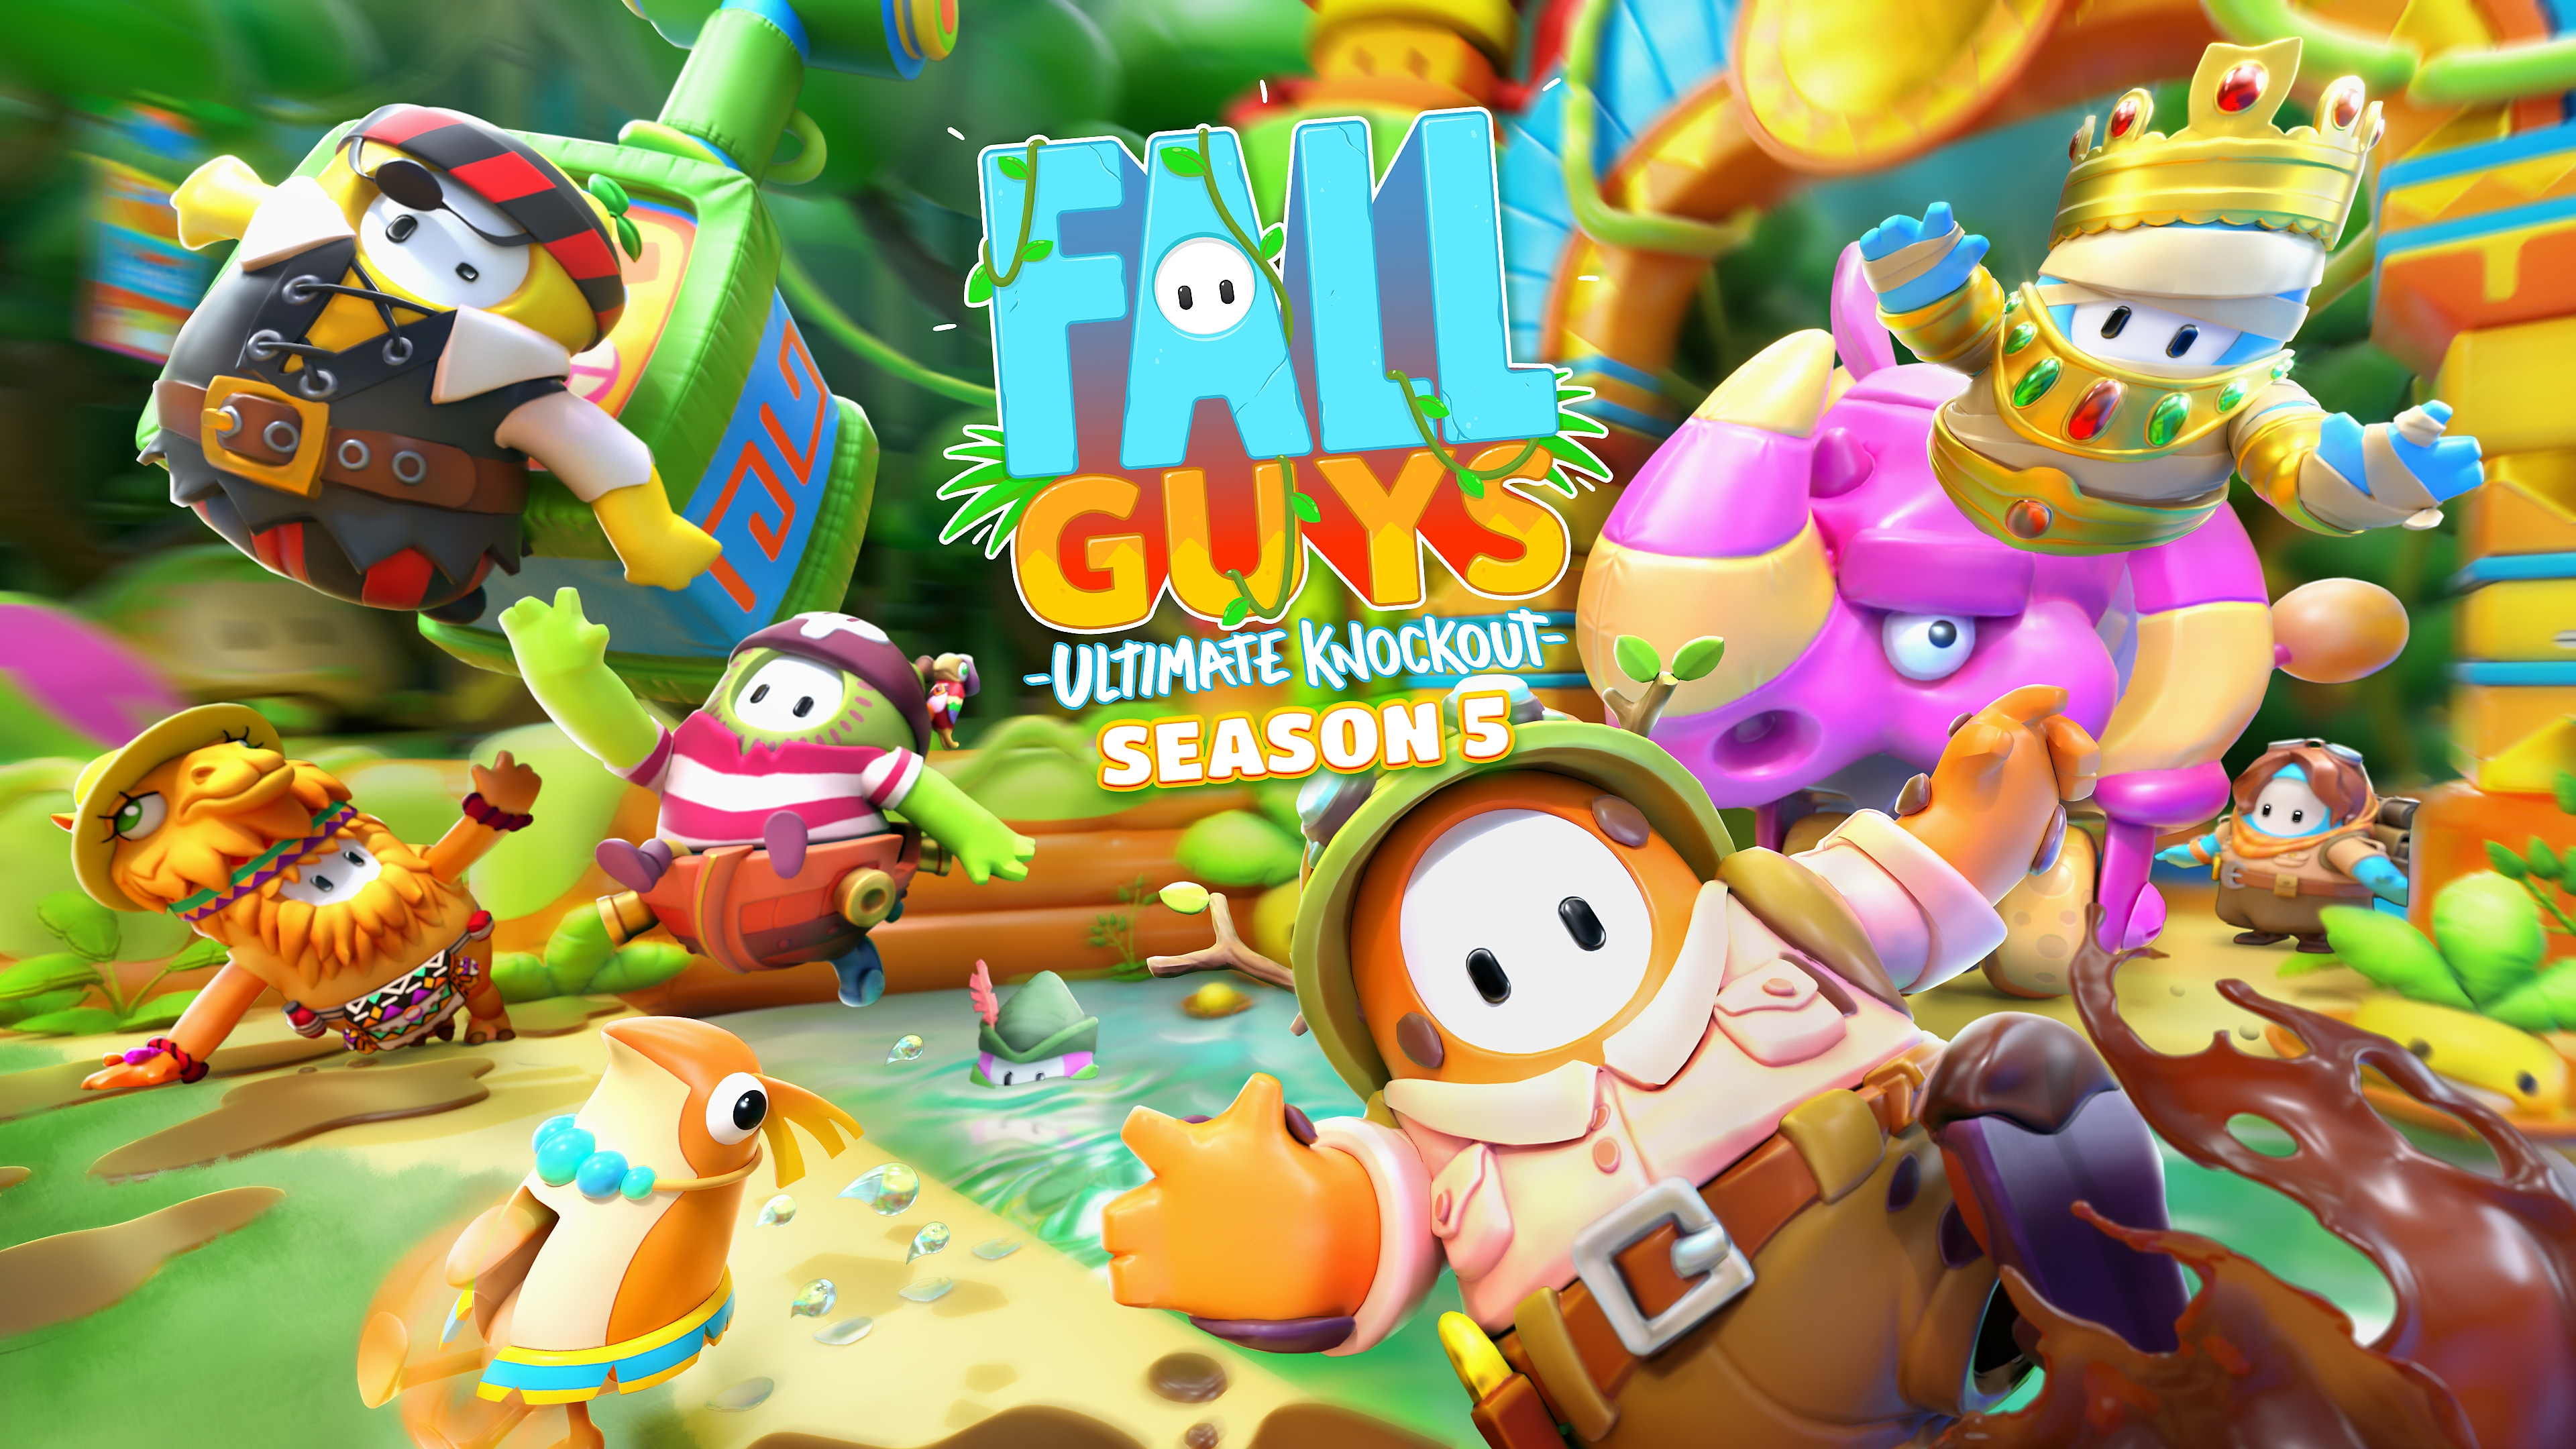 Fall Guys Season 5 artwork